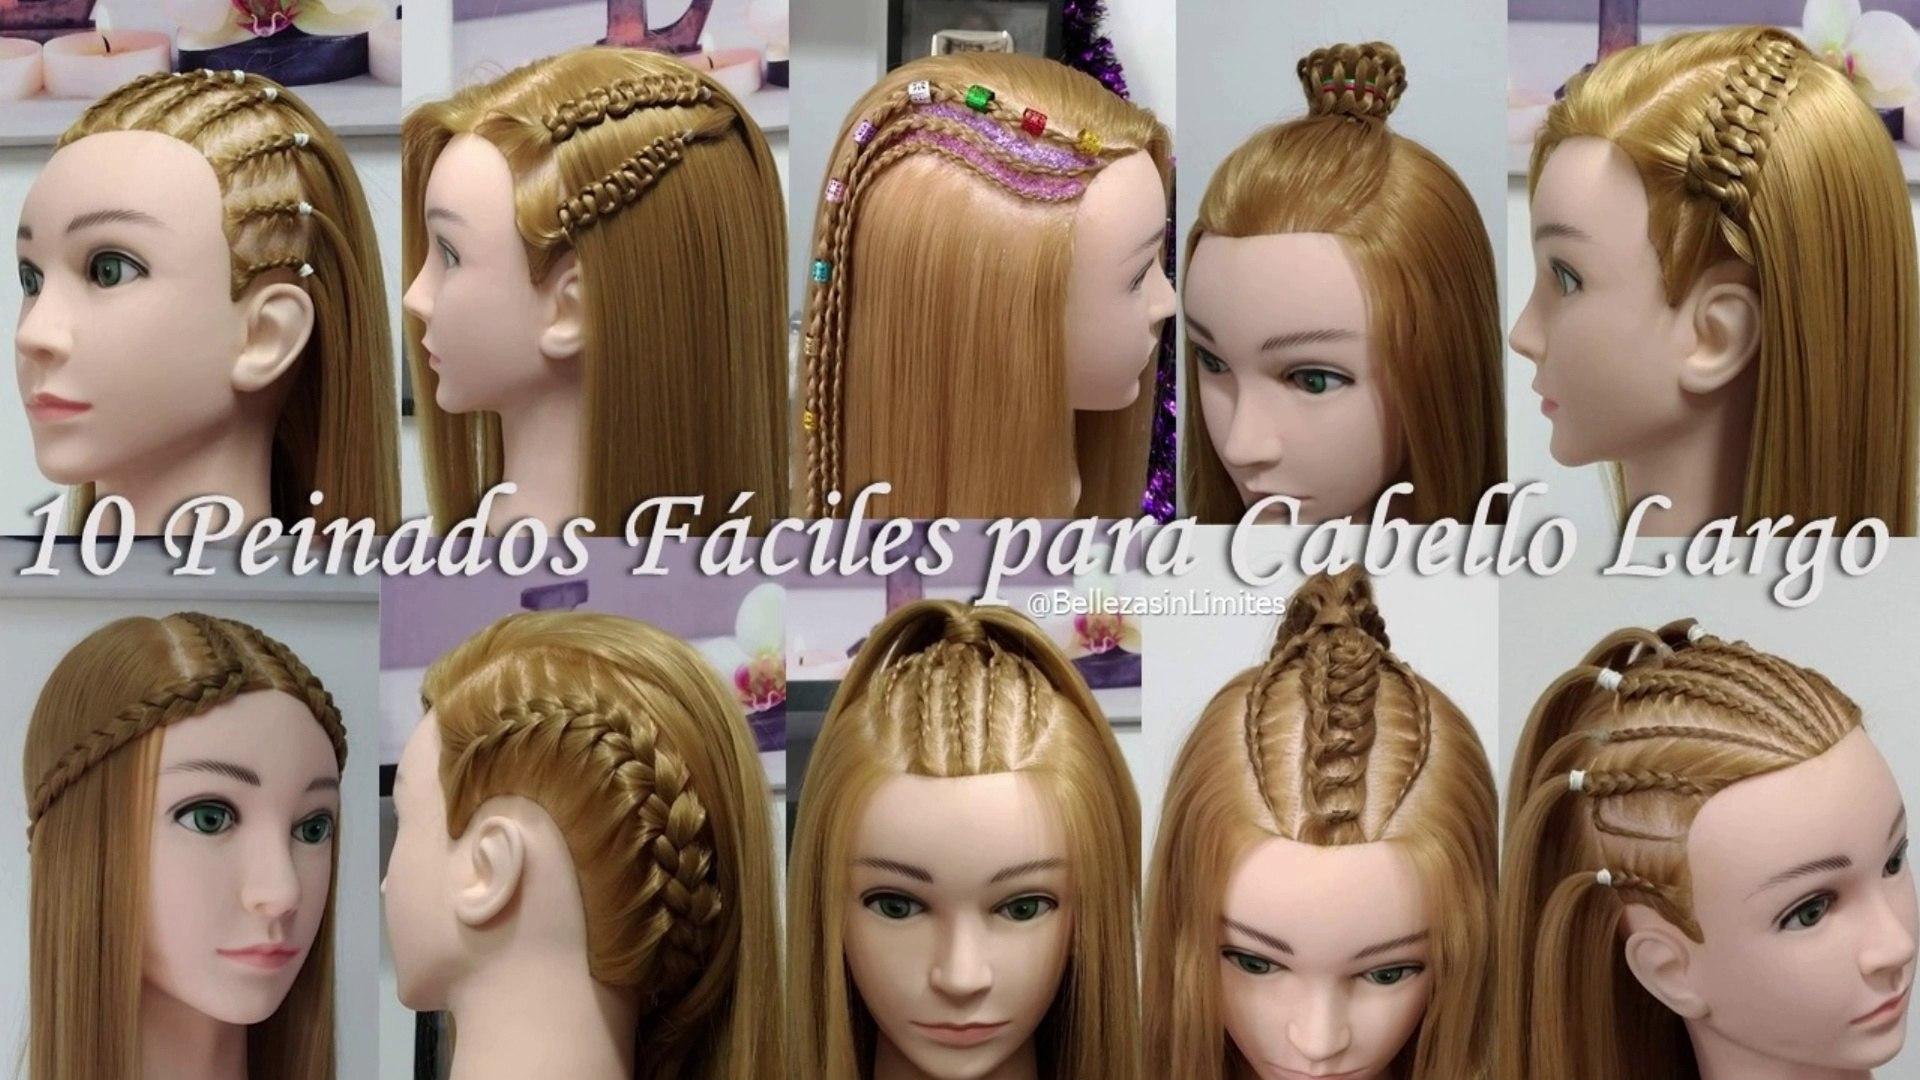 10 Peinados Fáciles Para Cabello Largo By Belleza Sin Limites